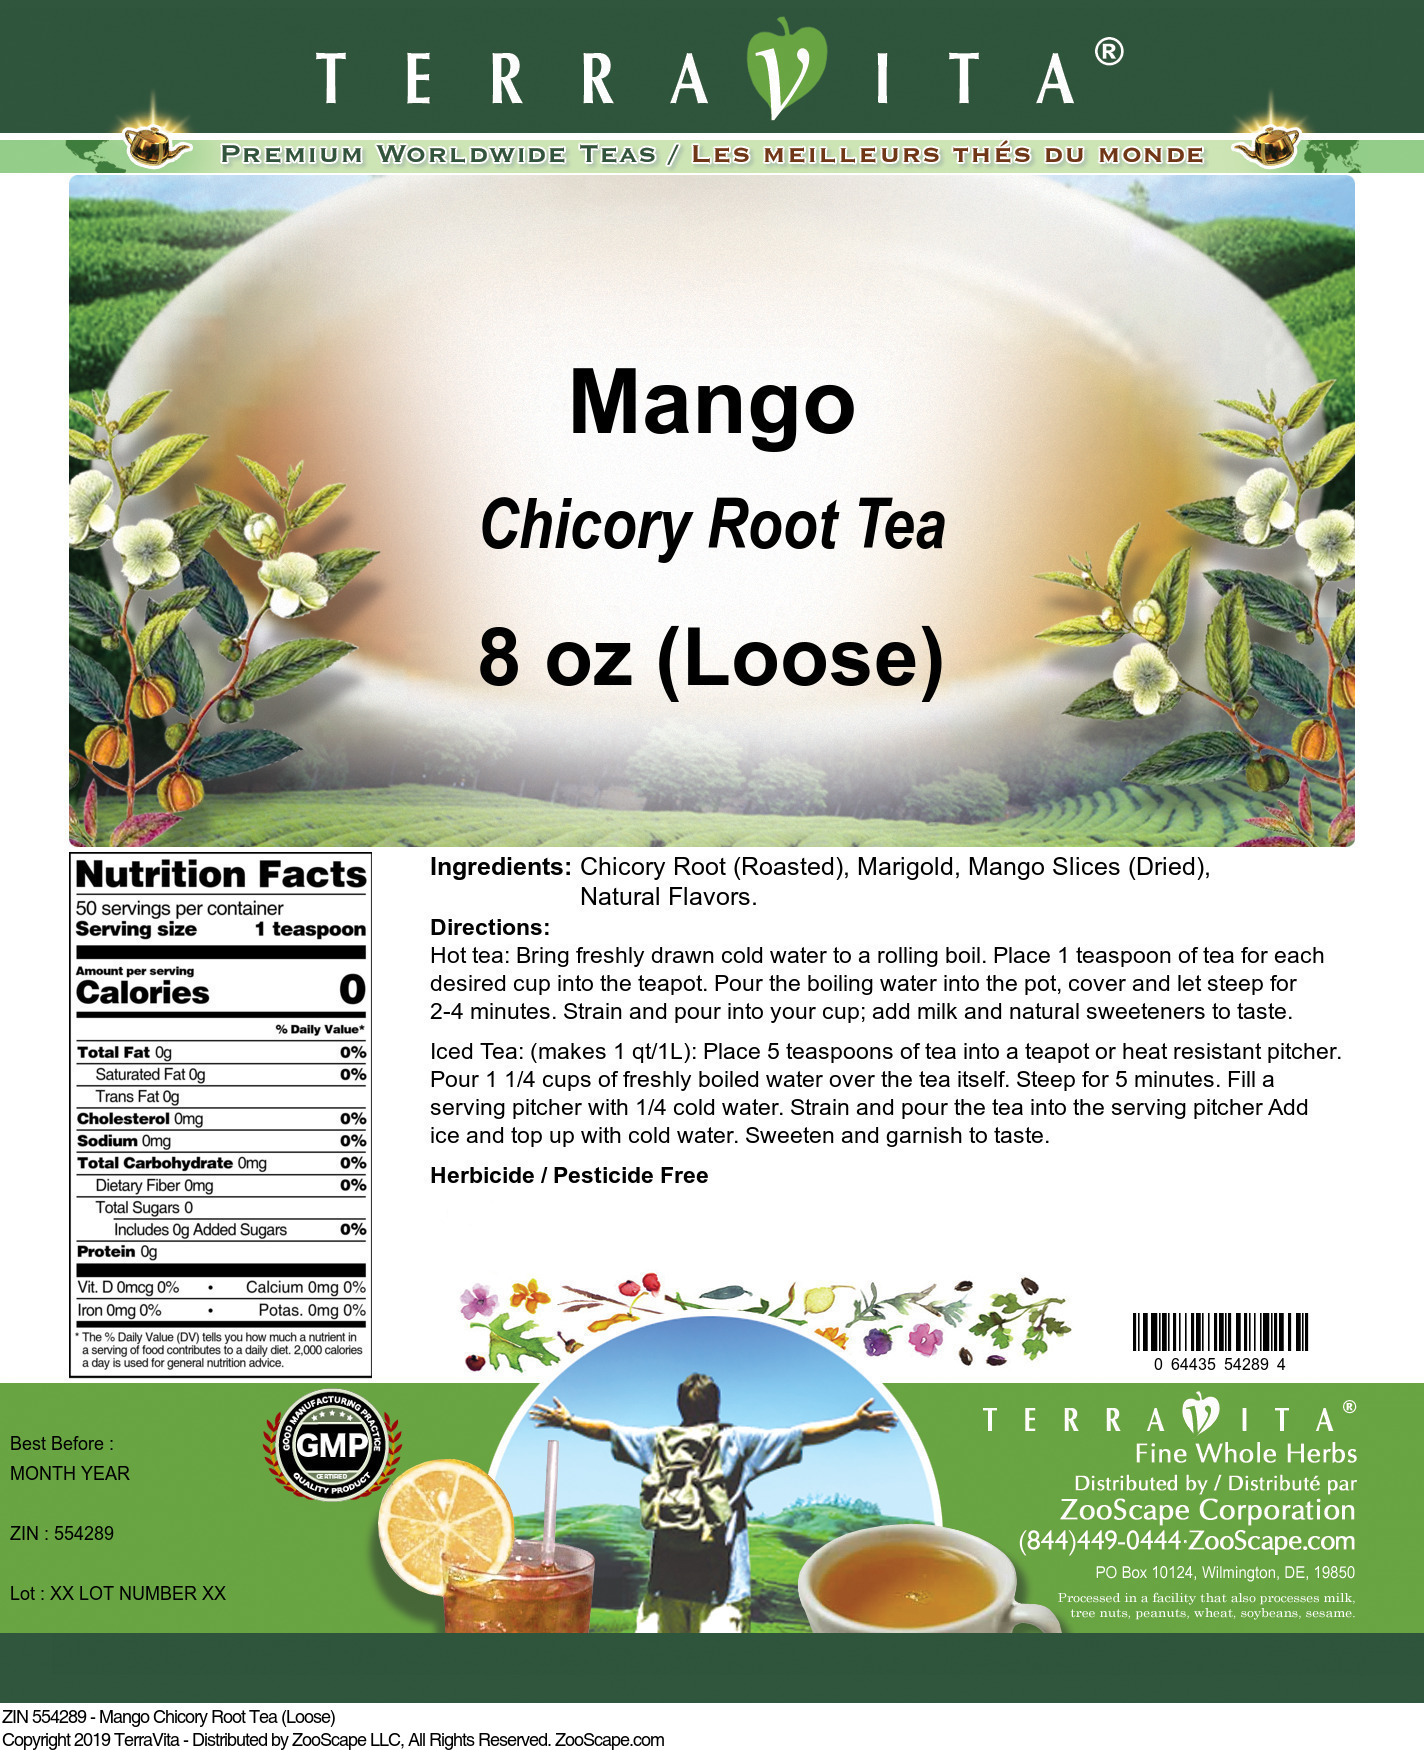 Mango Chicory Root Tea (Loose)